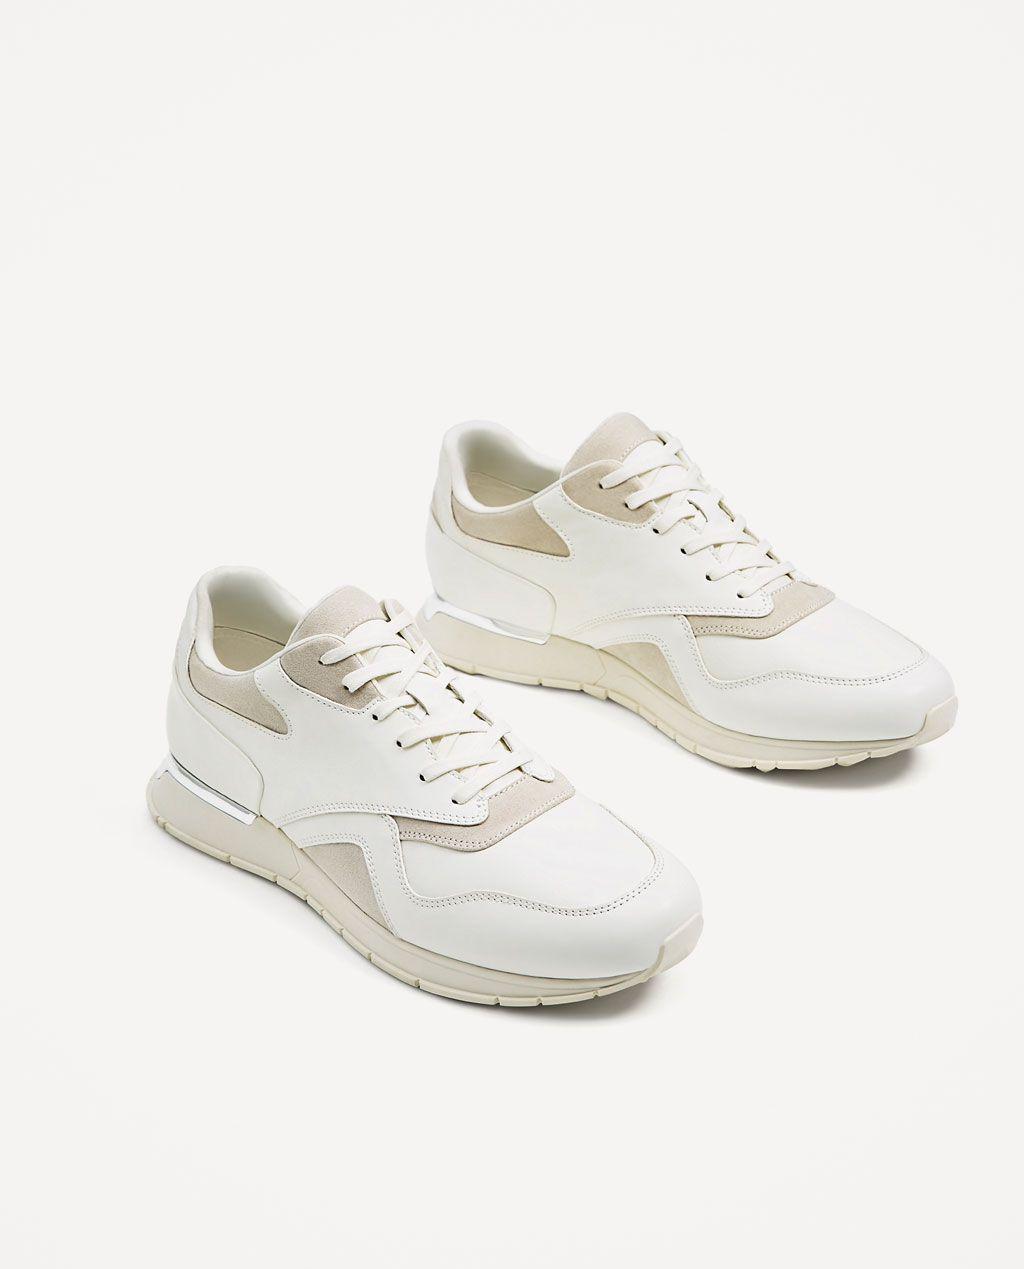 WMNS AIR MAX PLUS SLIP SP - CHAUSSURES - Sneakers & Tennis bassesNike YJxWIh3f